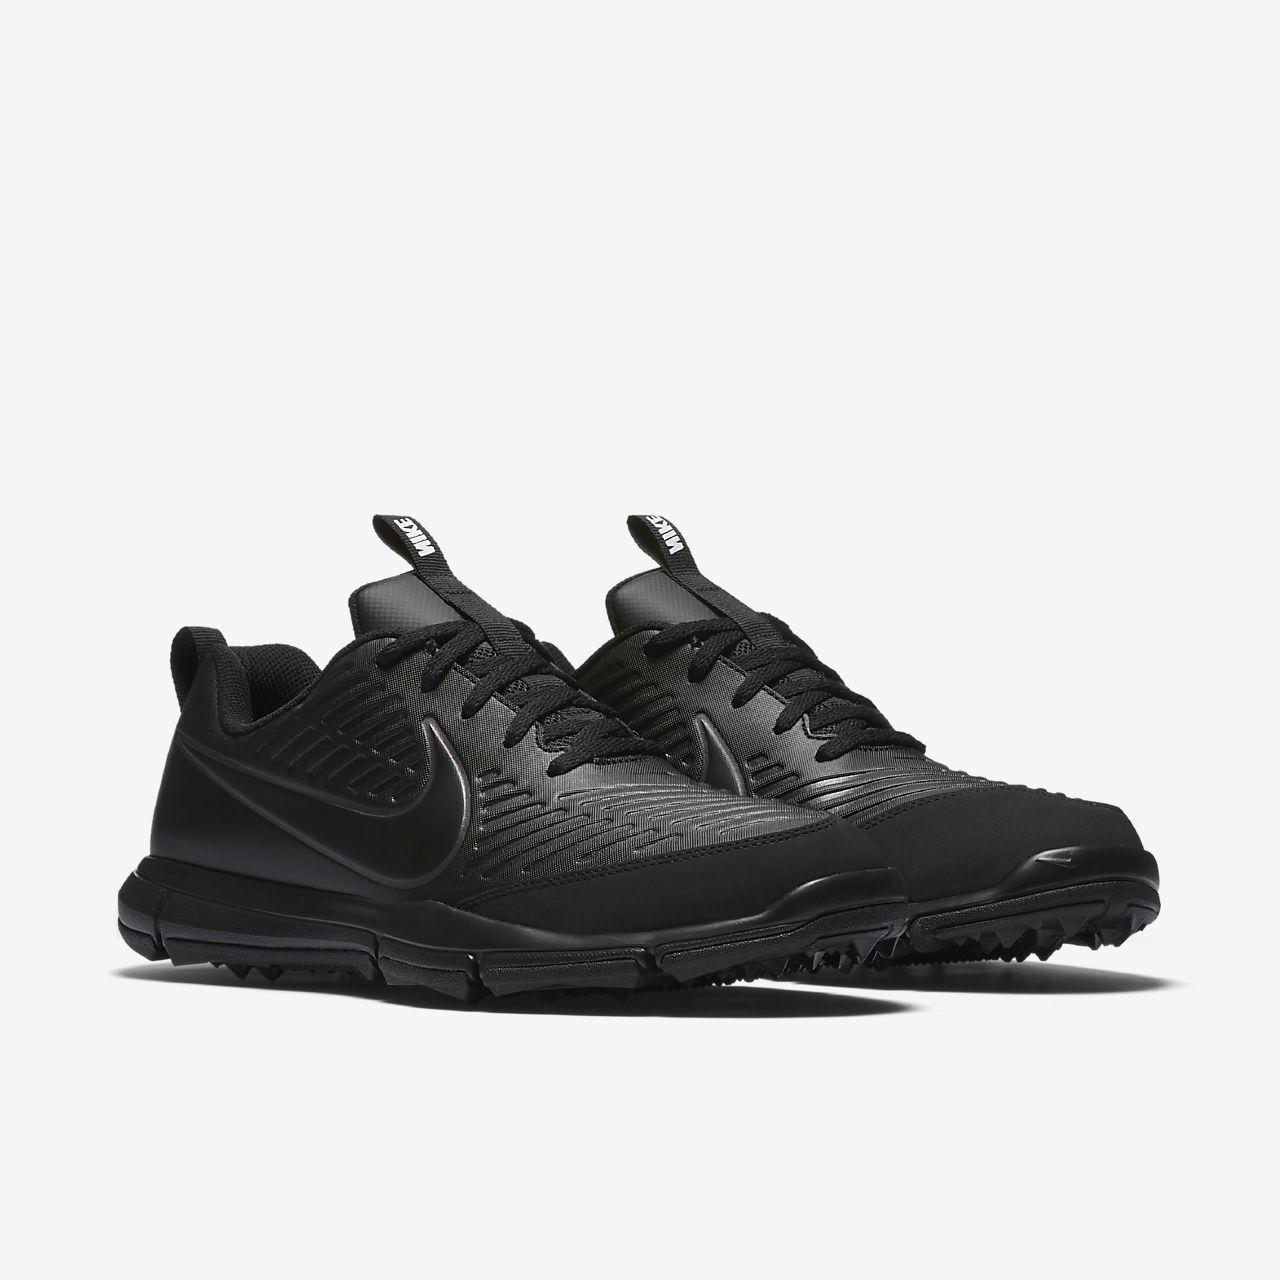 New Nike Men's Explorer 2 Golf Shoes Black 849957-001